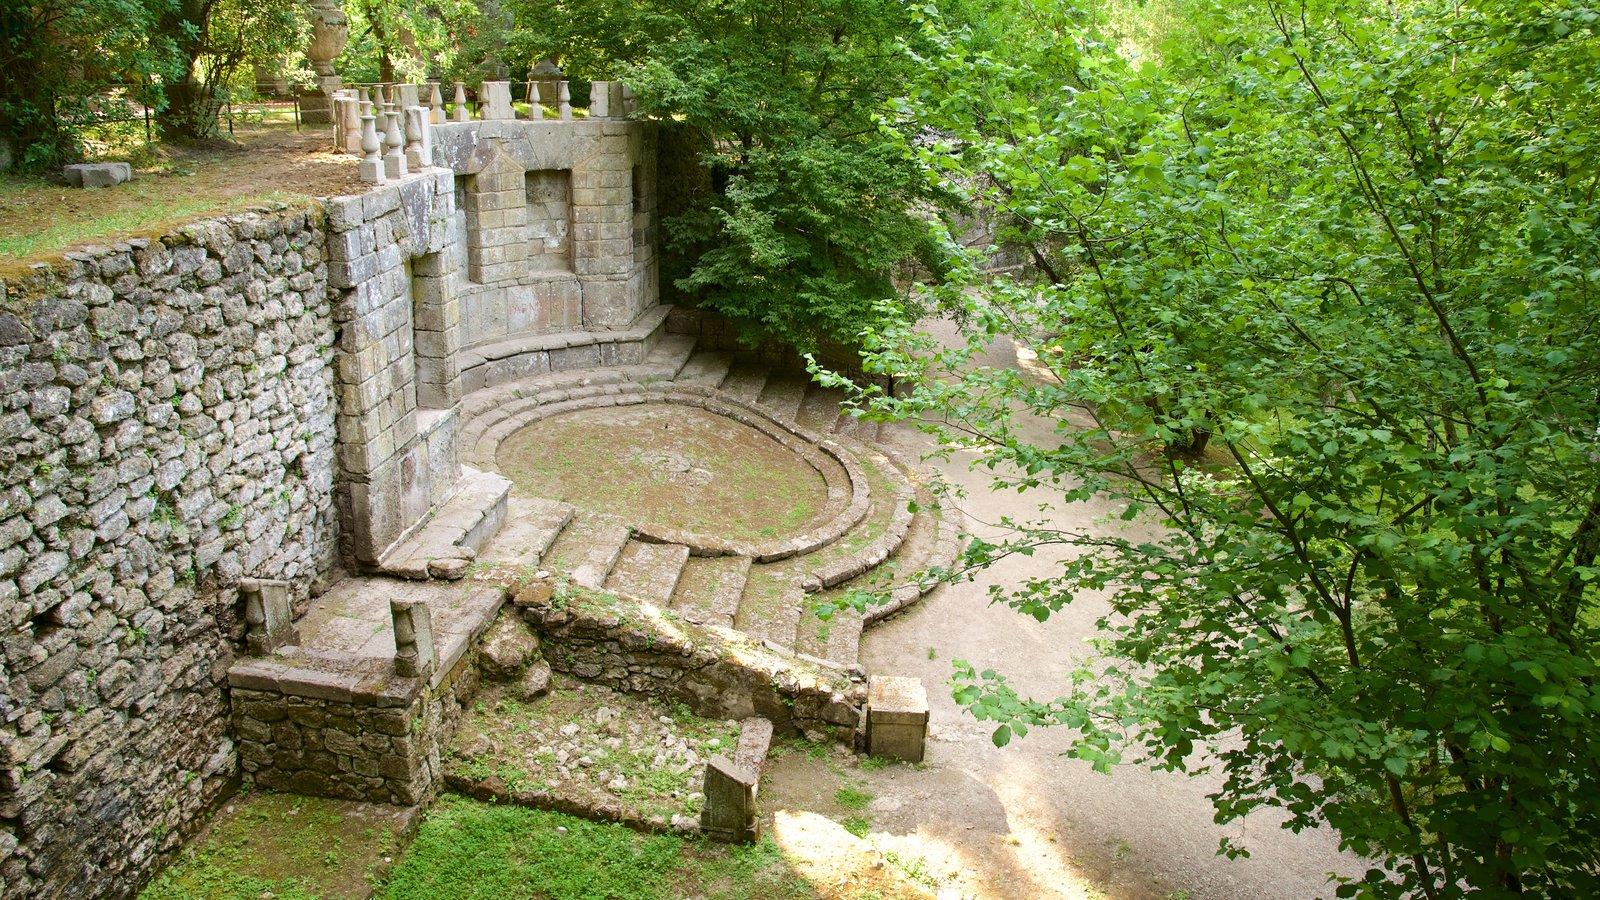 Parco dei Mostri featuring building ruins